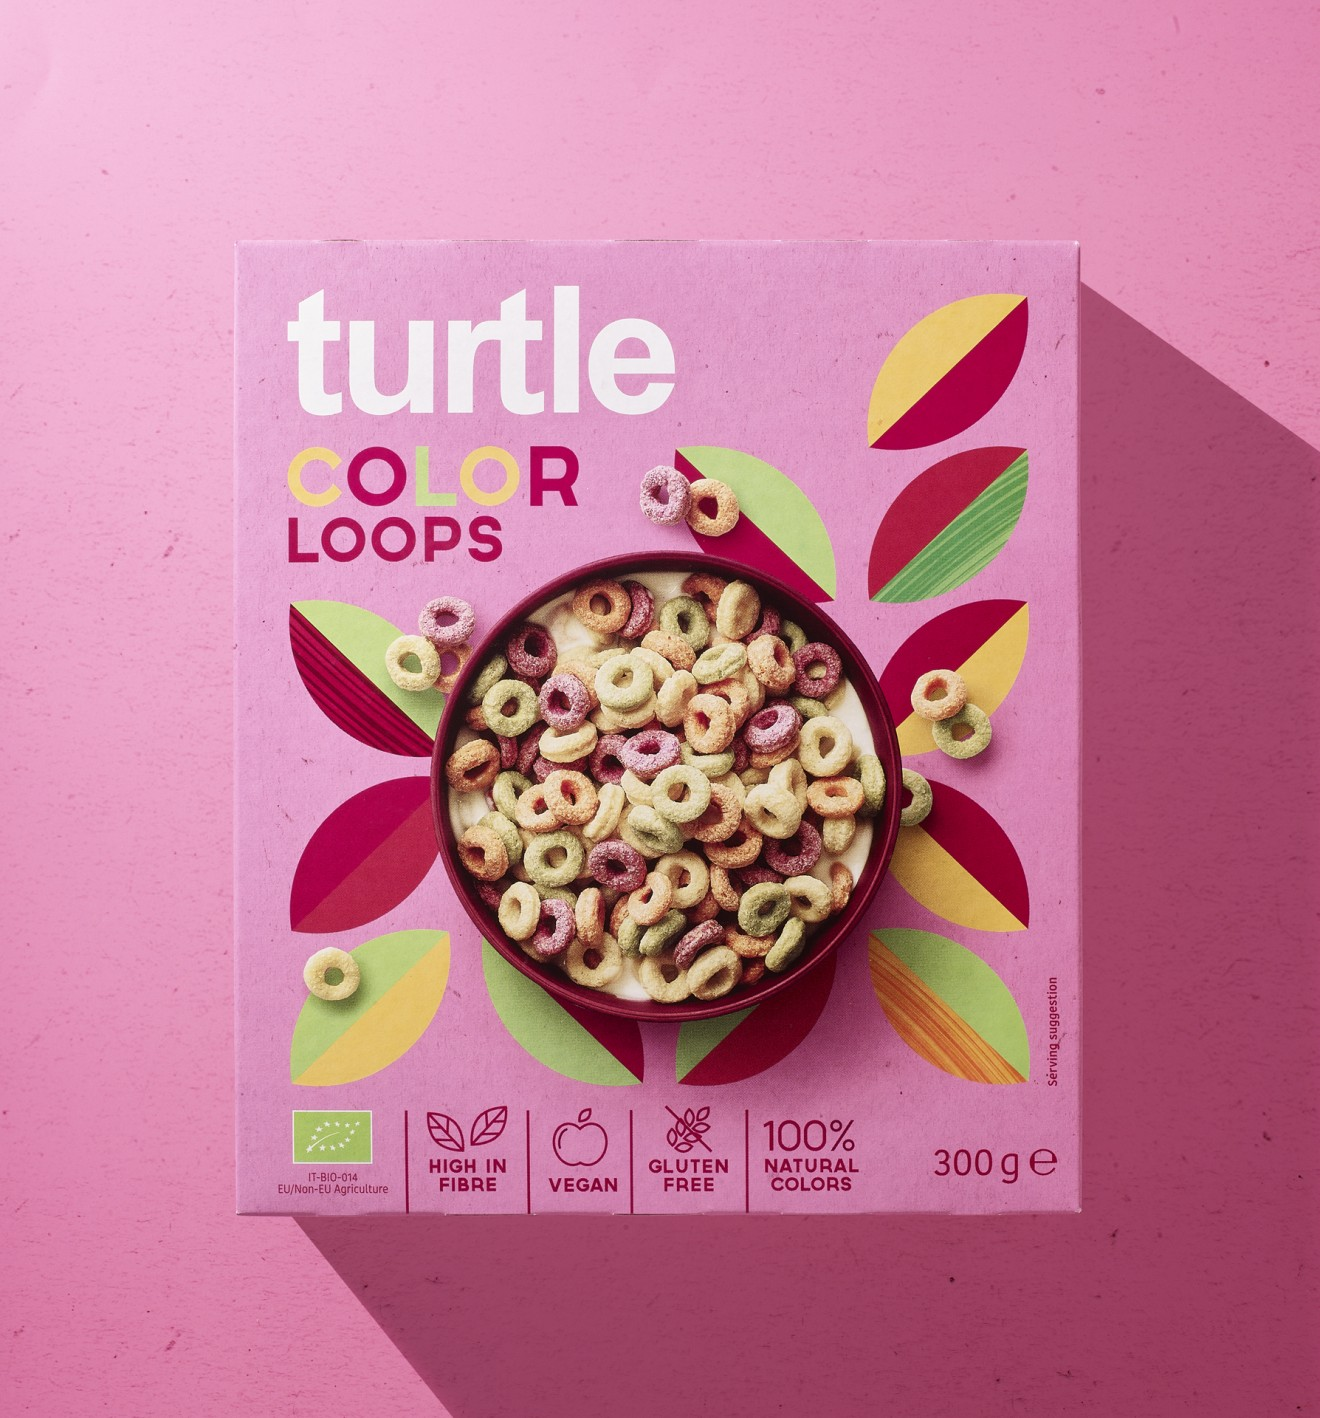 Quatre Mains package design - color loops, healthy, cereals, retro, vintage, pattern, decorative, quatre mains, turtl